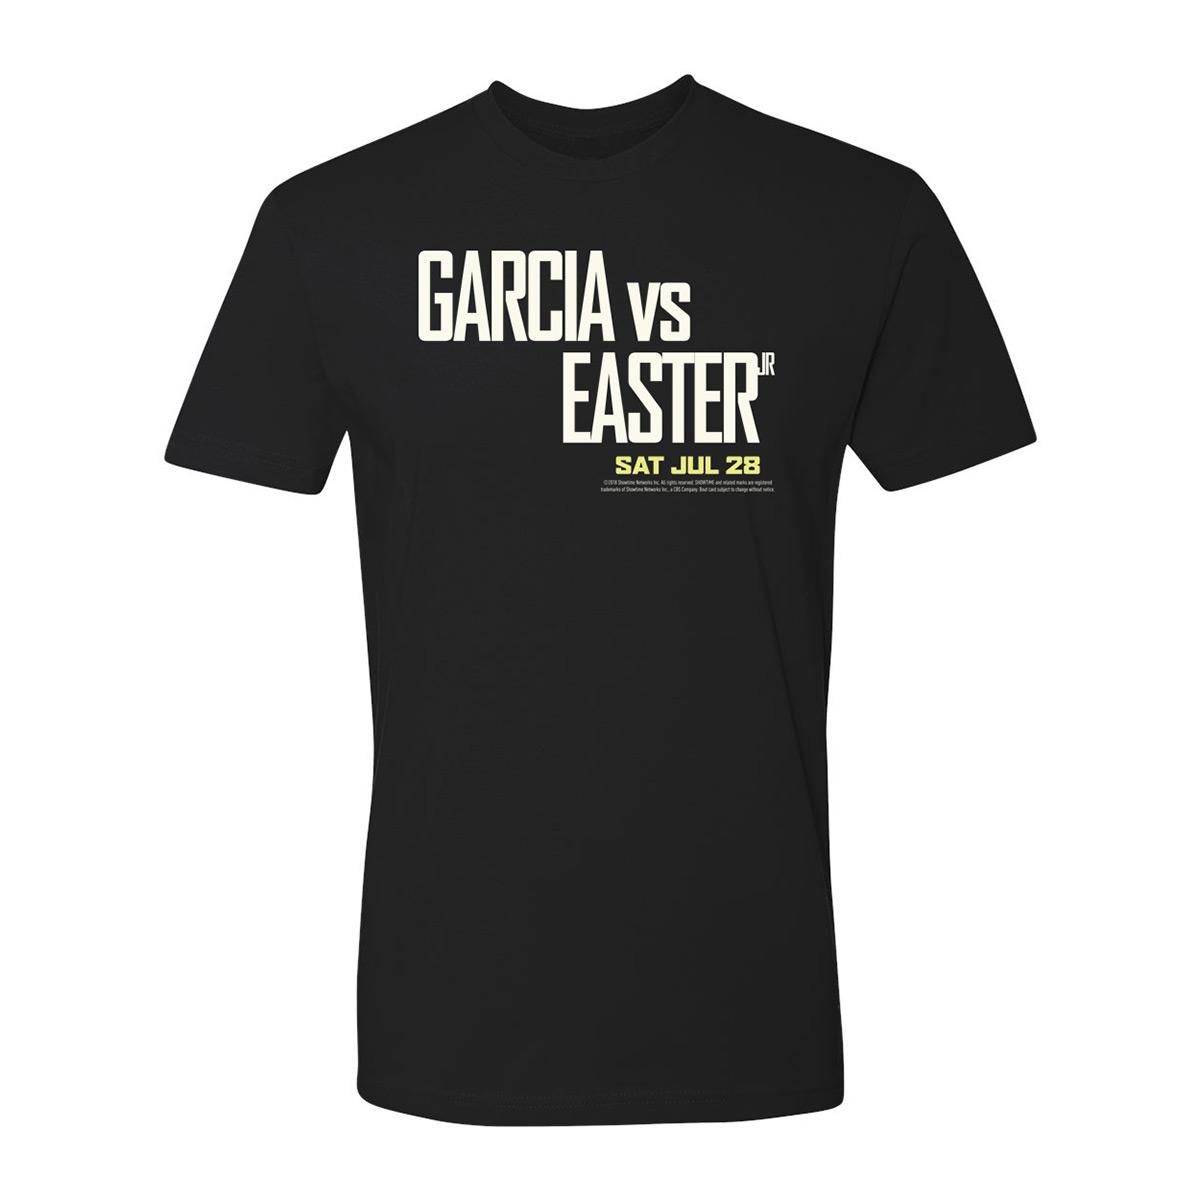 Garcia vs Easter Jr. T-Shirt (Black)